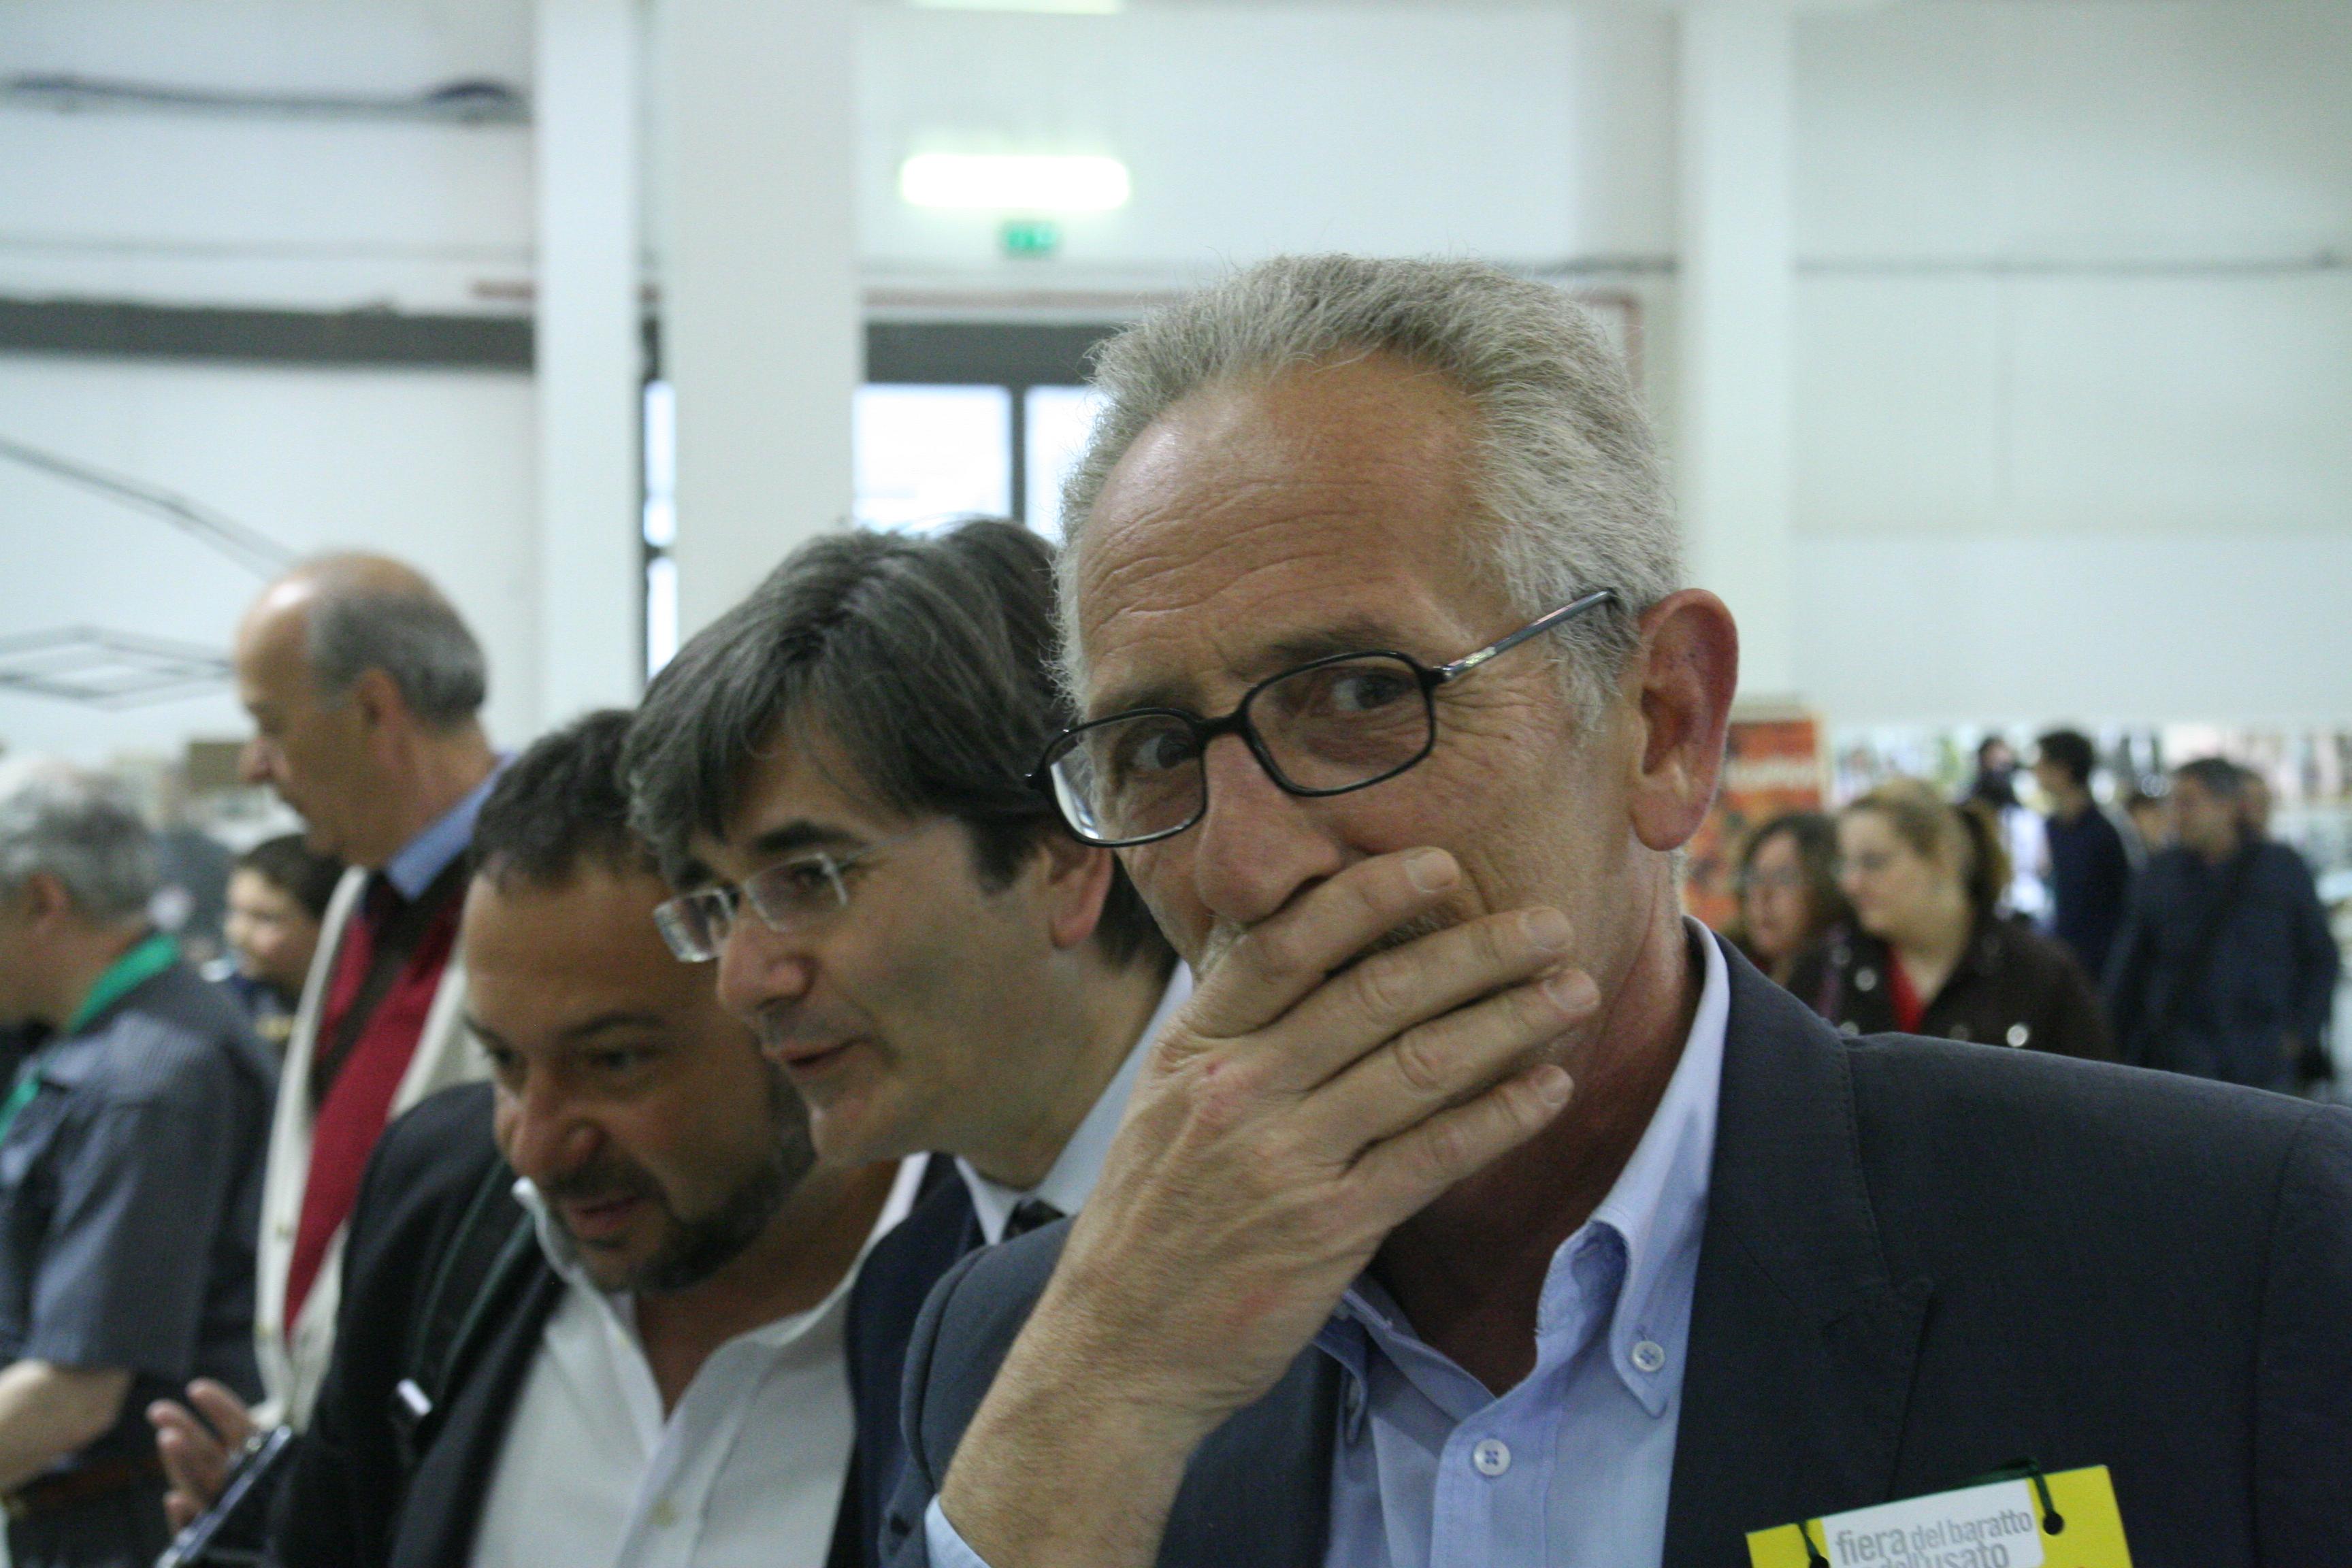 Alan De Luca ai microfoni di Road Tv Italia